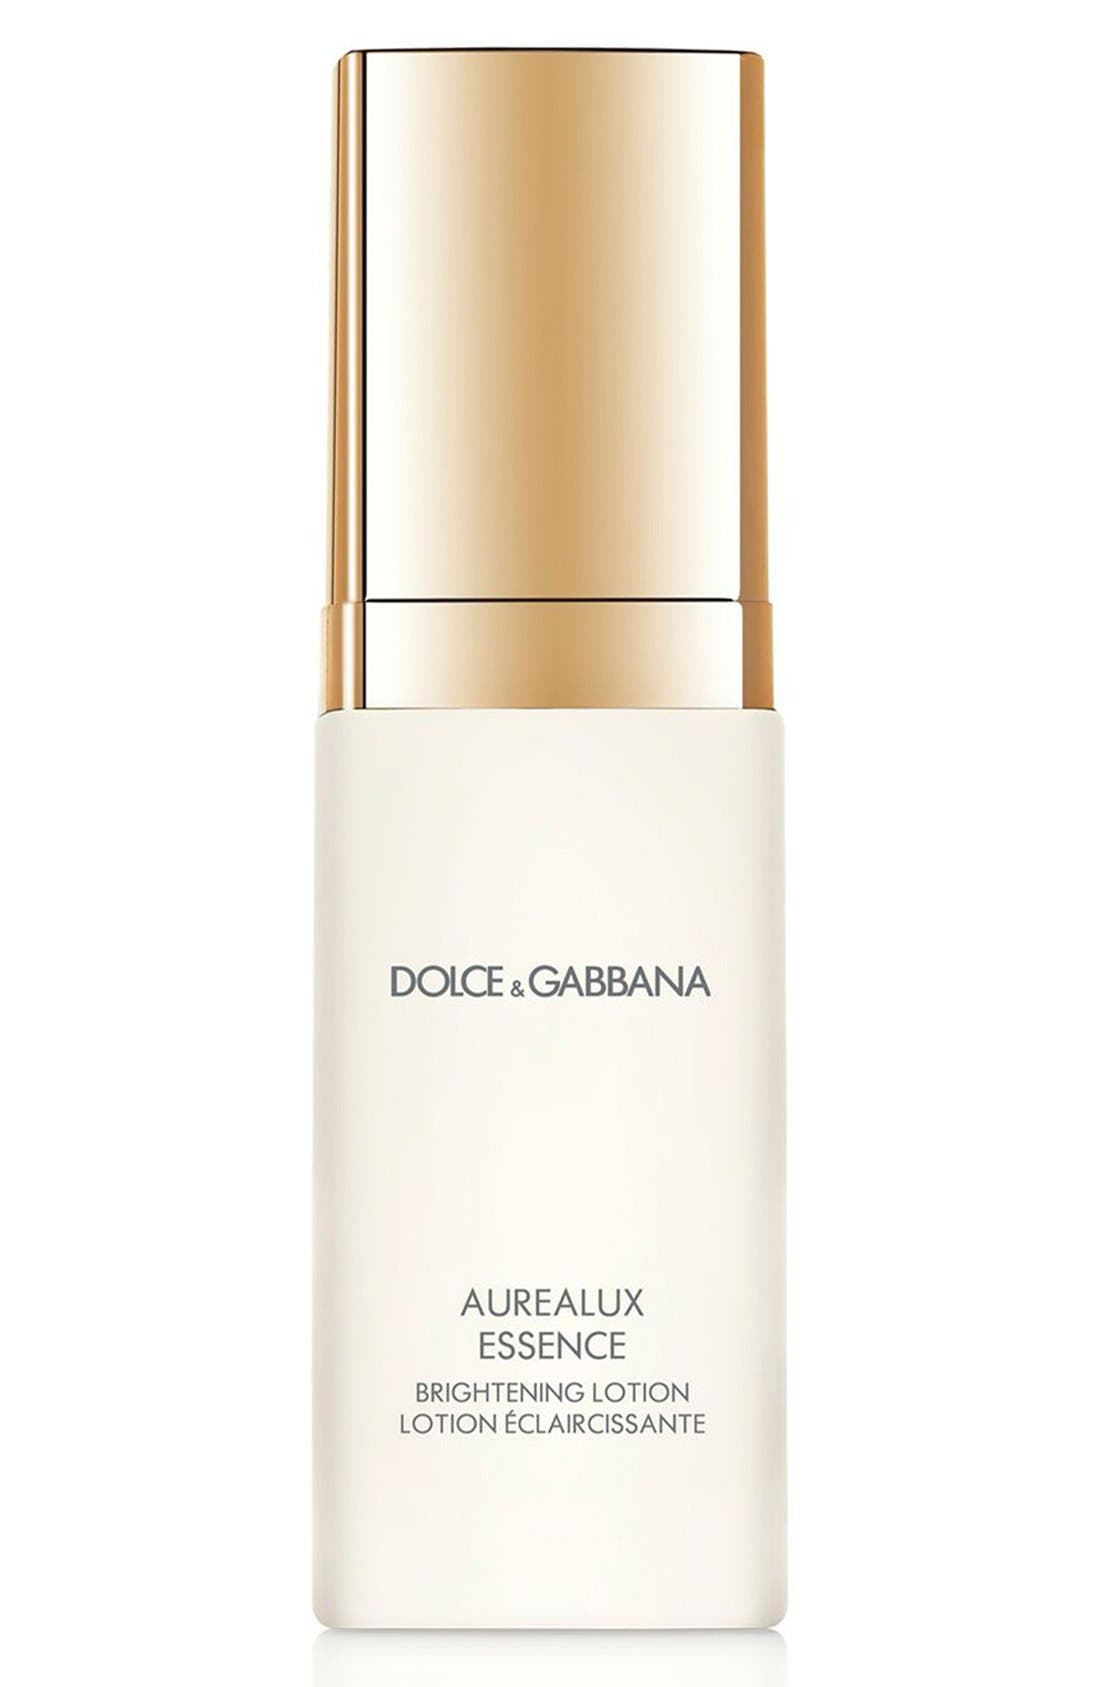 Dolce&GabbanaBeauty 'Aurealux' Essence Brightening Lotion,                             Alternate thumbnail 2, color,                             000